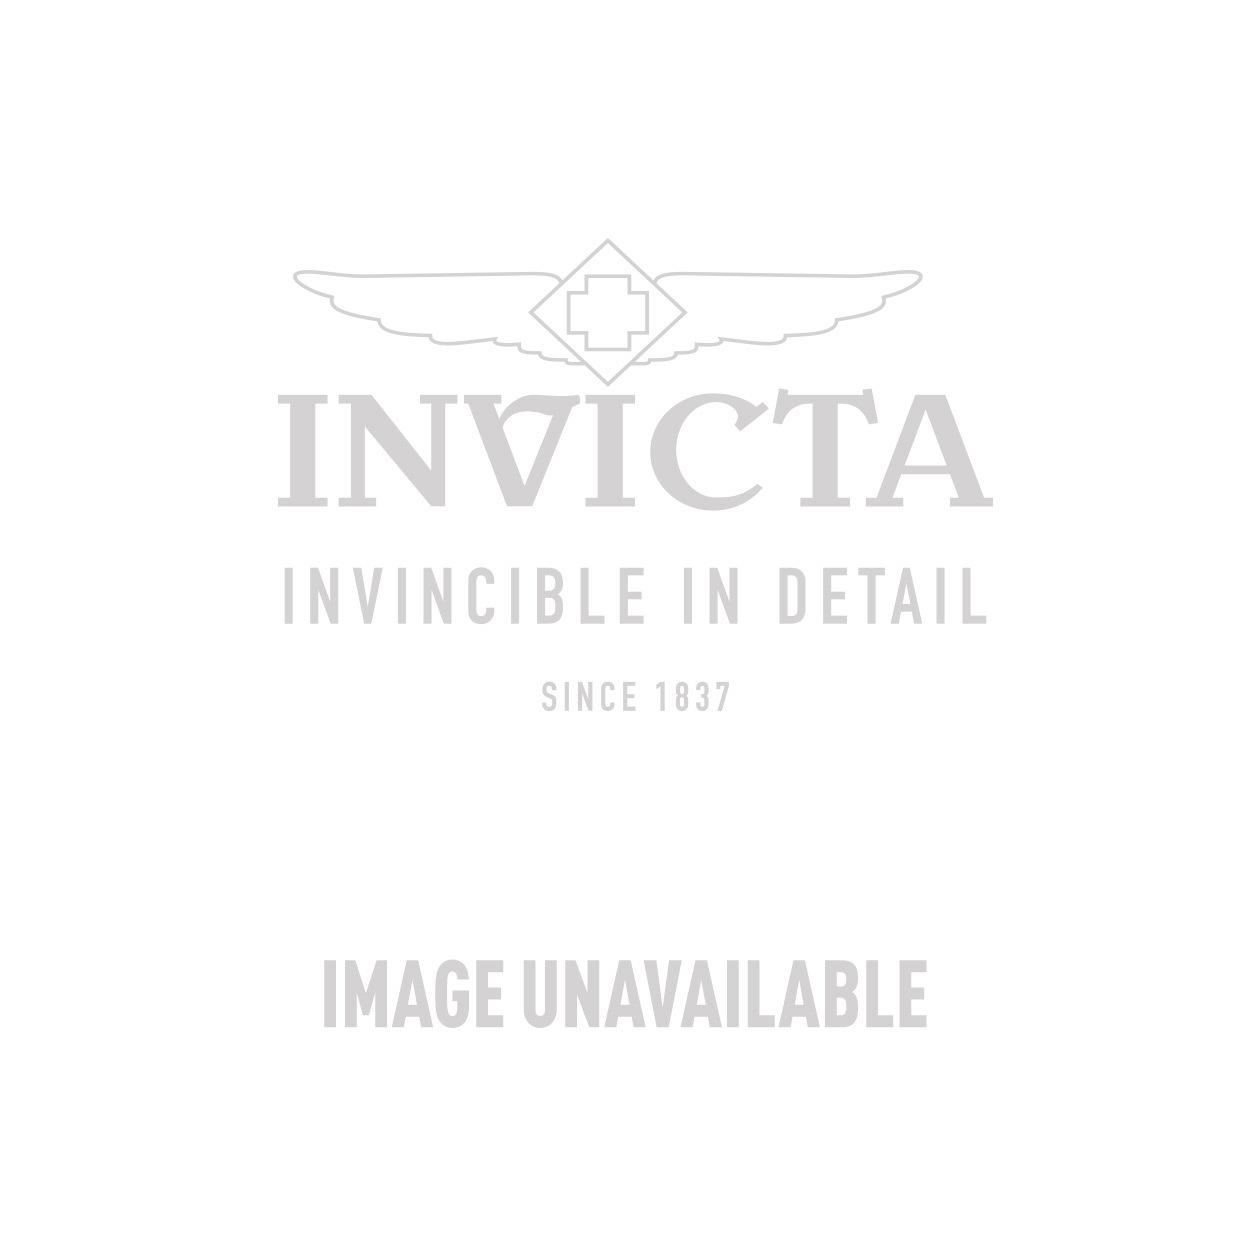 Invicta Reserve Mens Automatic 48mm Black Case Black Dial - Model 18700